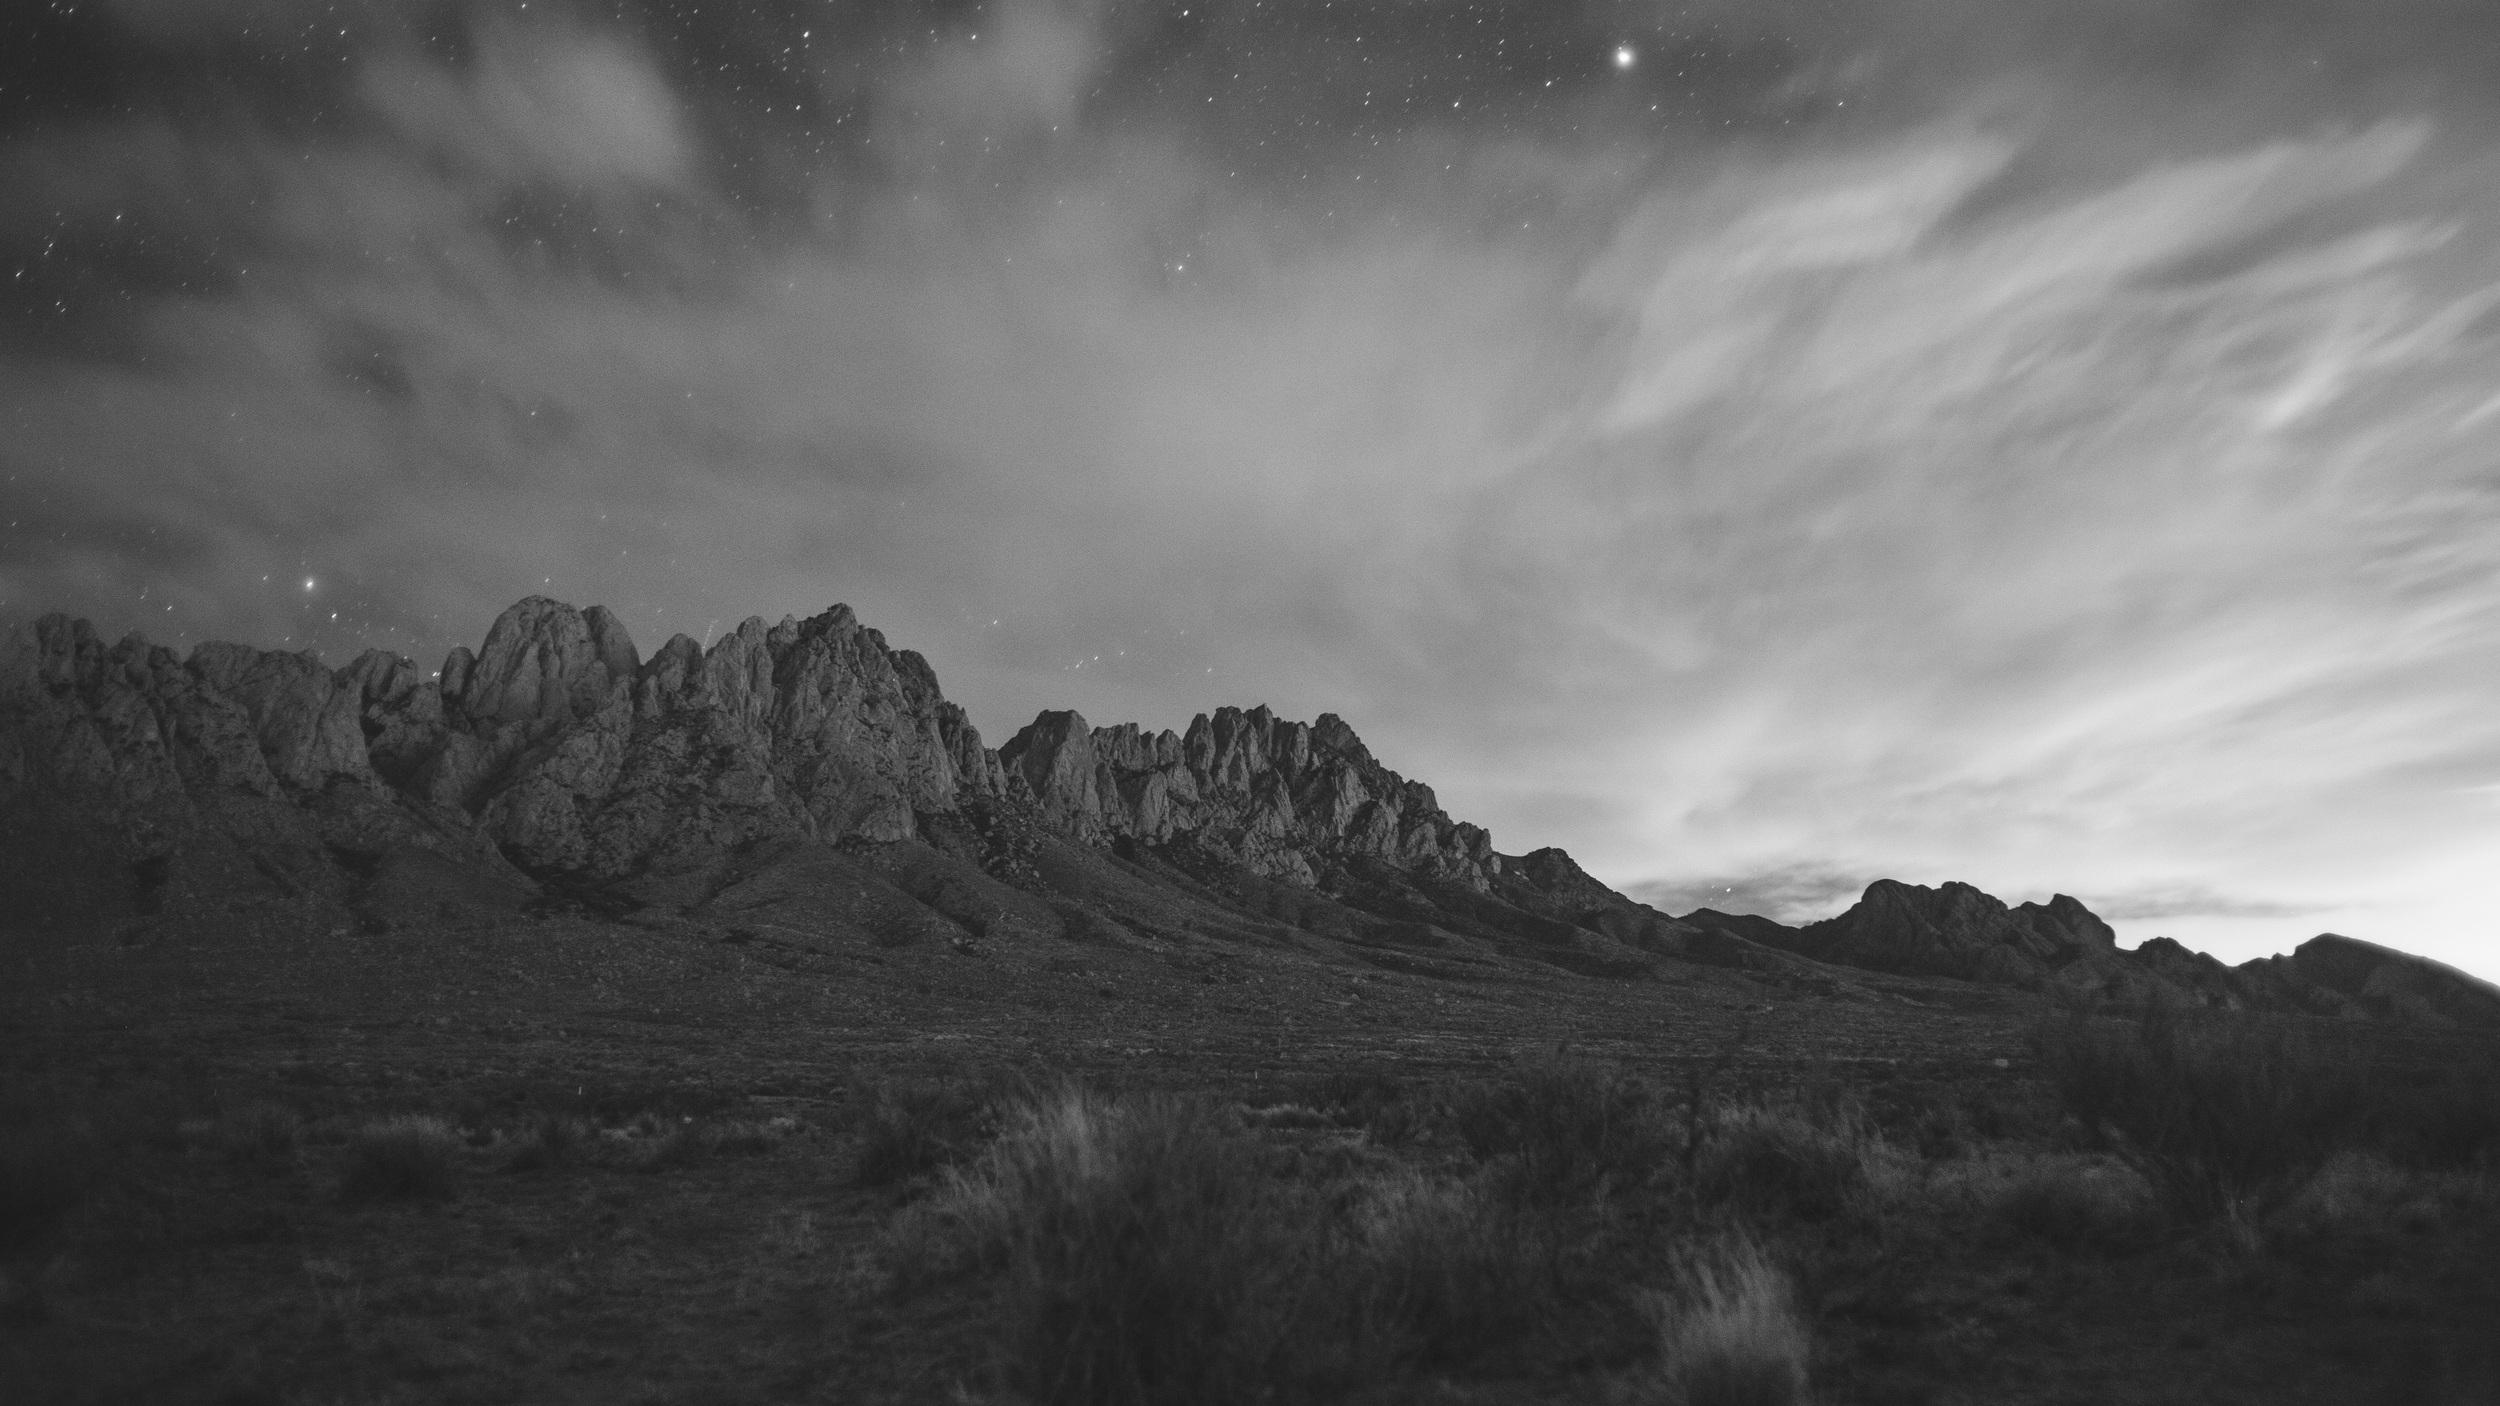 Organ Mountains - Black and White-7326.jpg